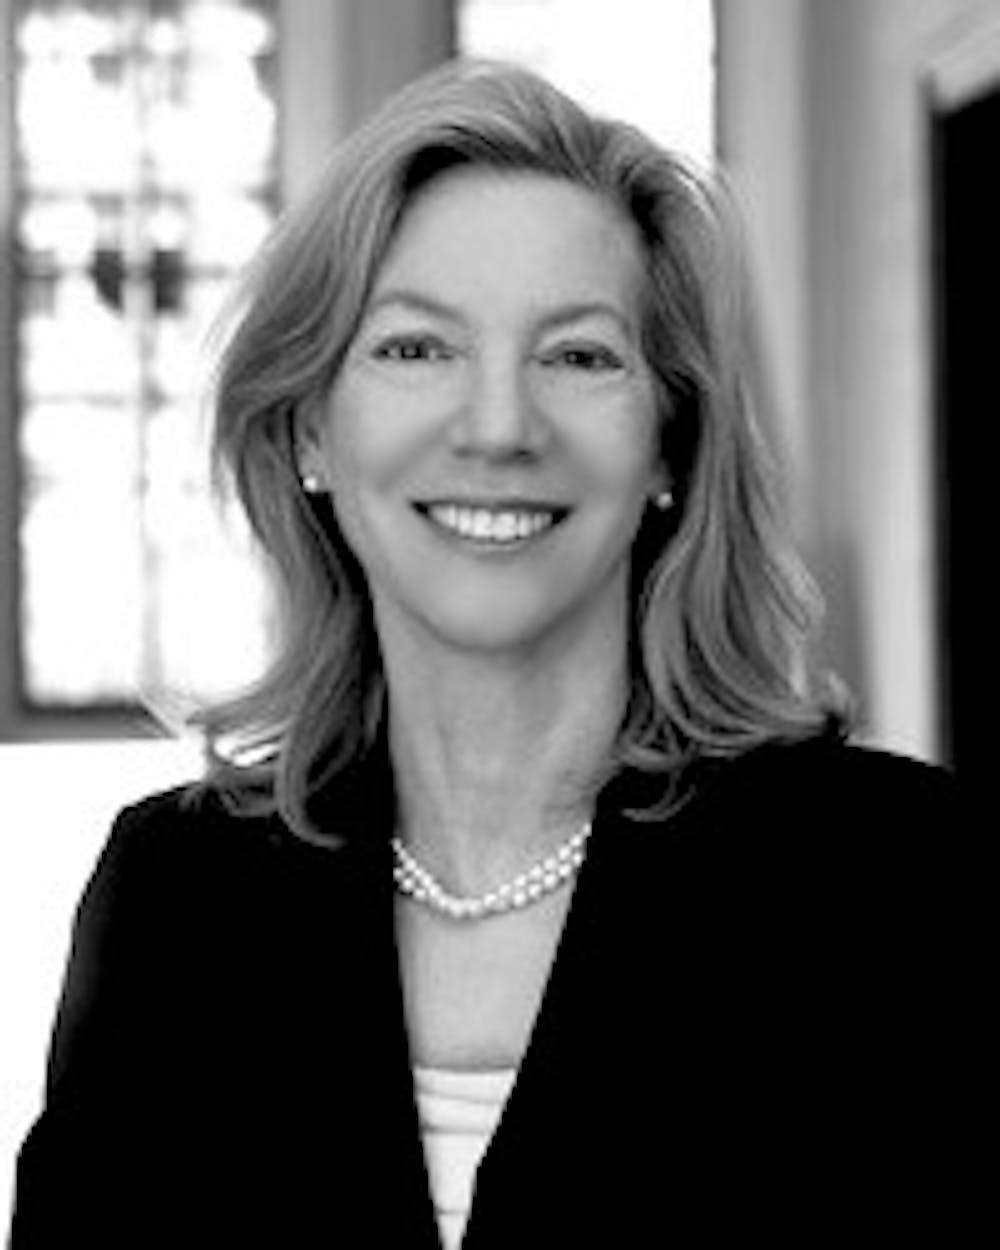 <p><em>Amy Gutmann</em><br /><strong>University President</strong></p>